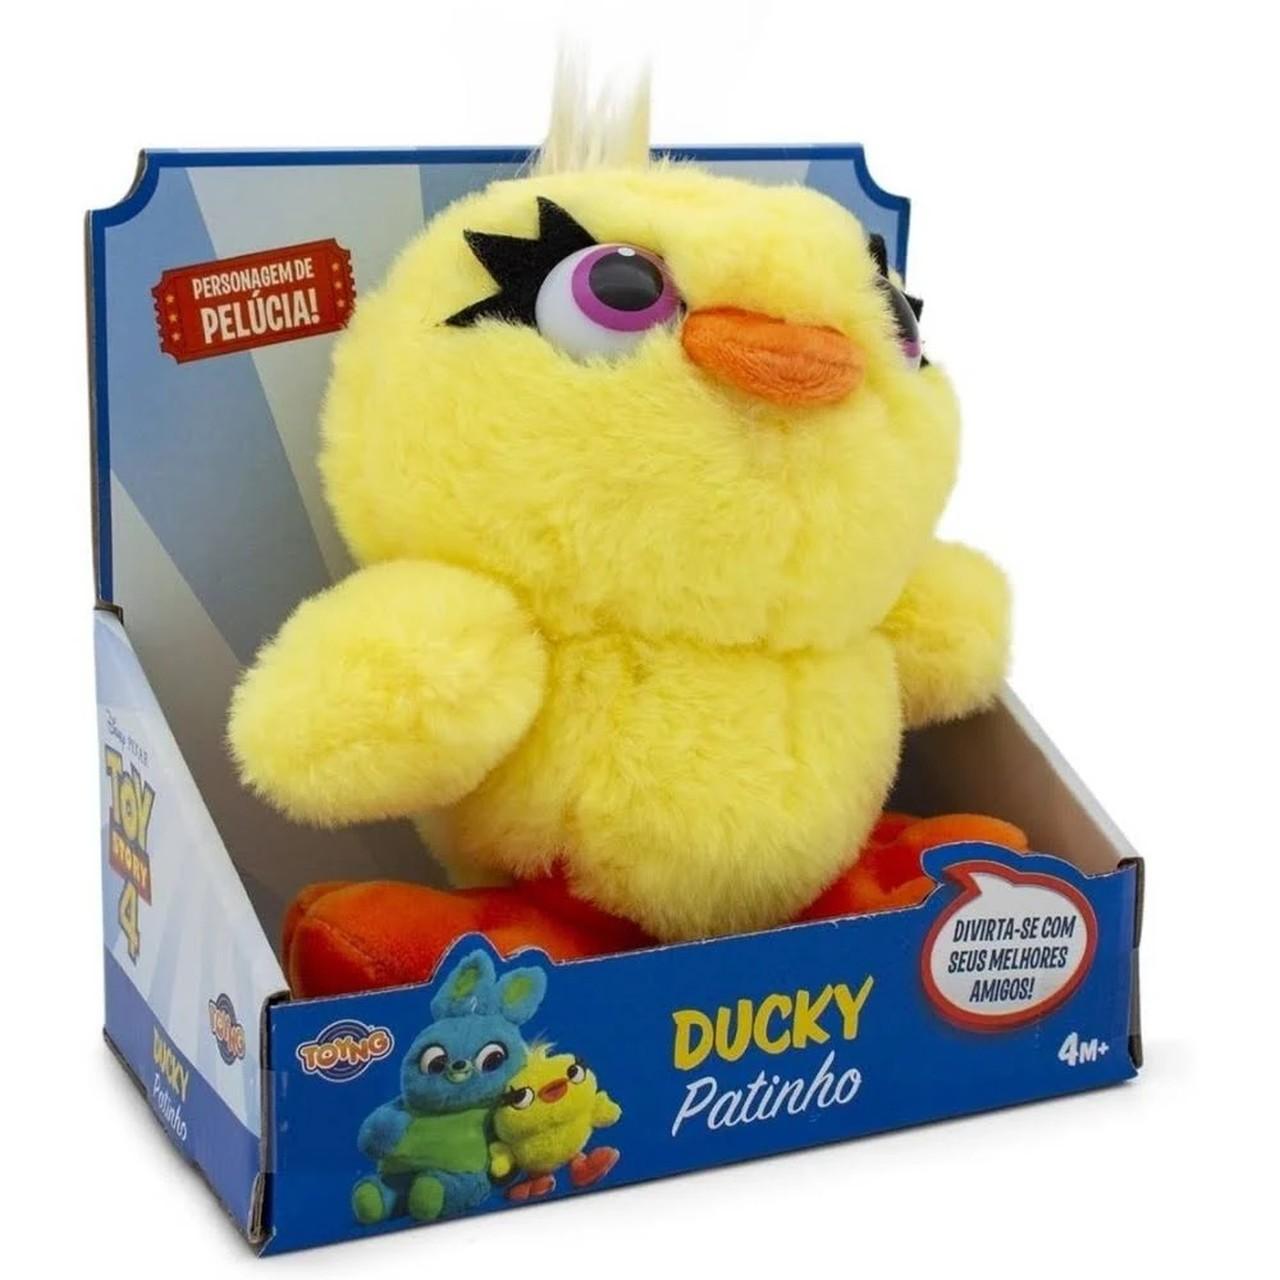 Pelúcia Toy Story - Patinho Ducky 17cm - Disney Pixar Toyng